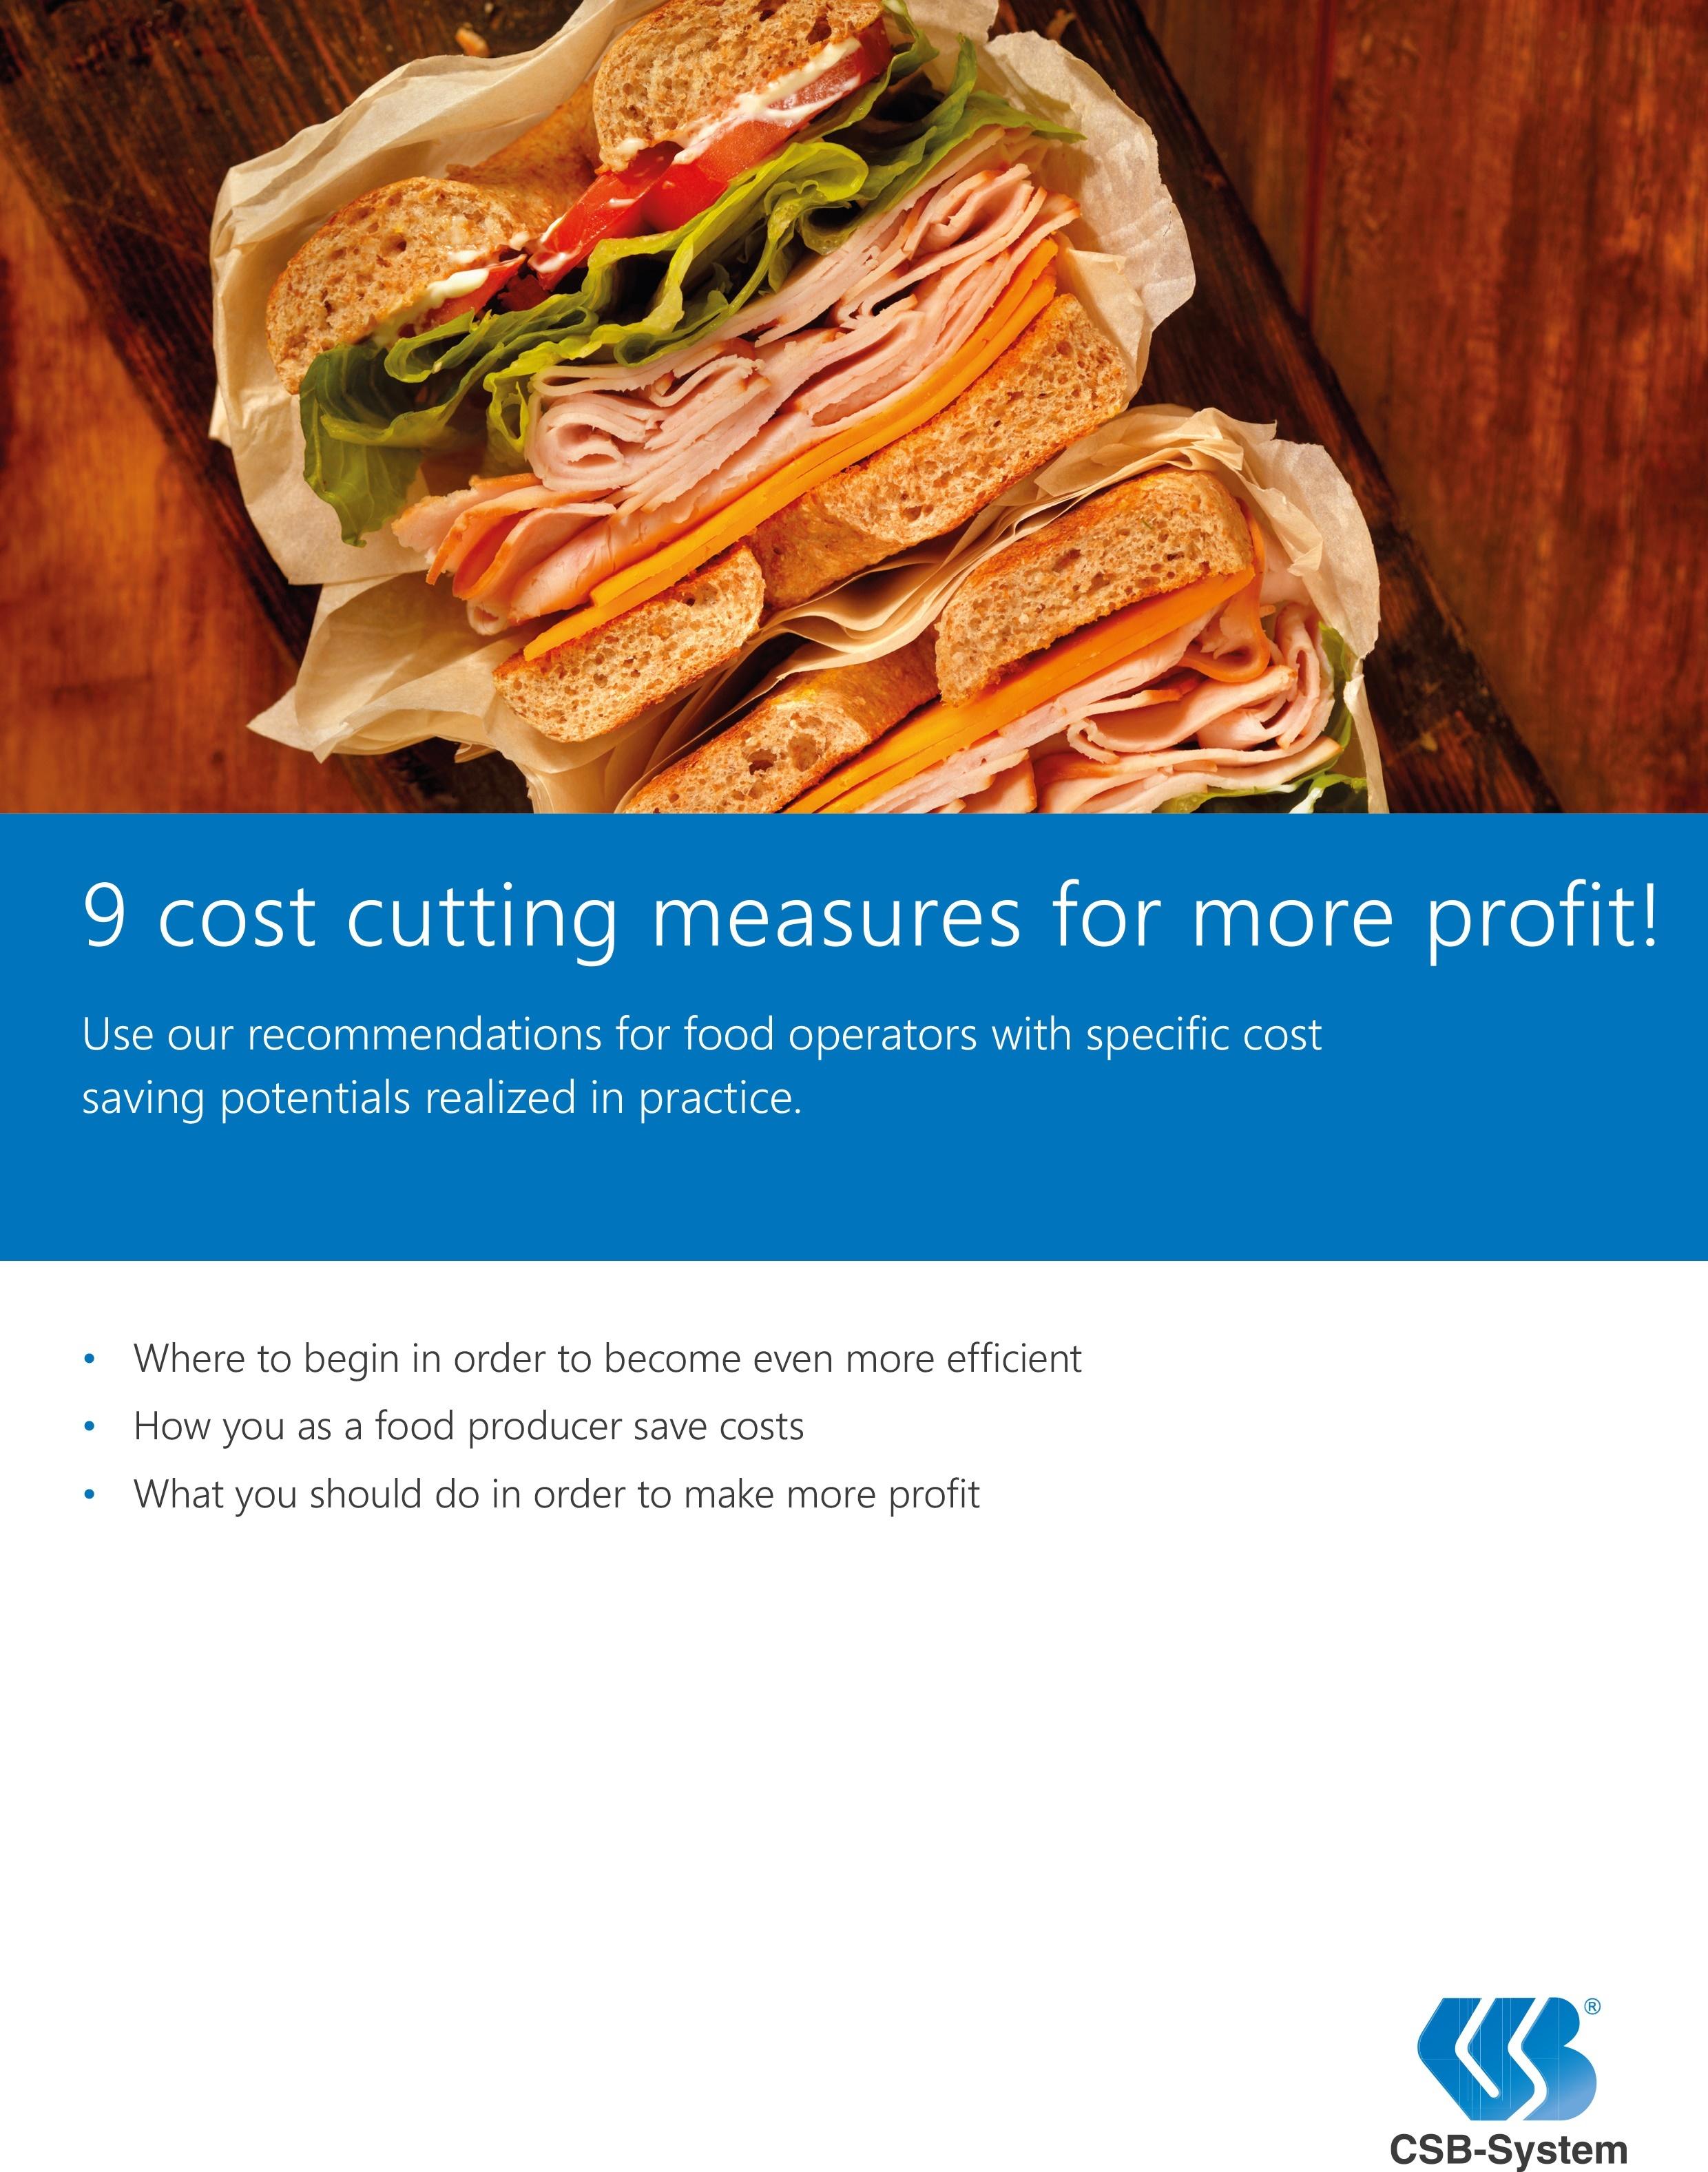 EN_Whitepaper_9 cost cutting.jpg